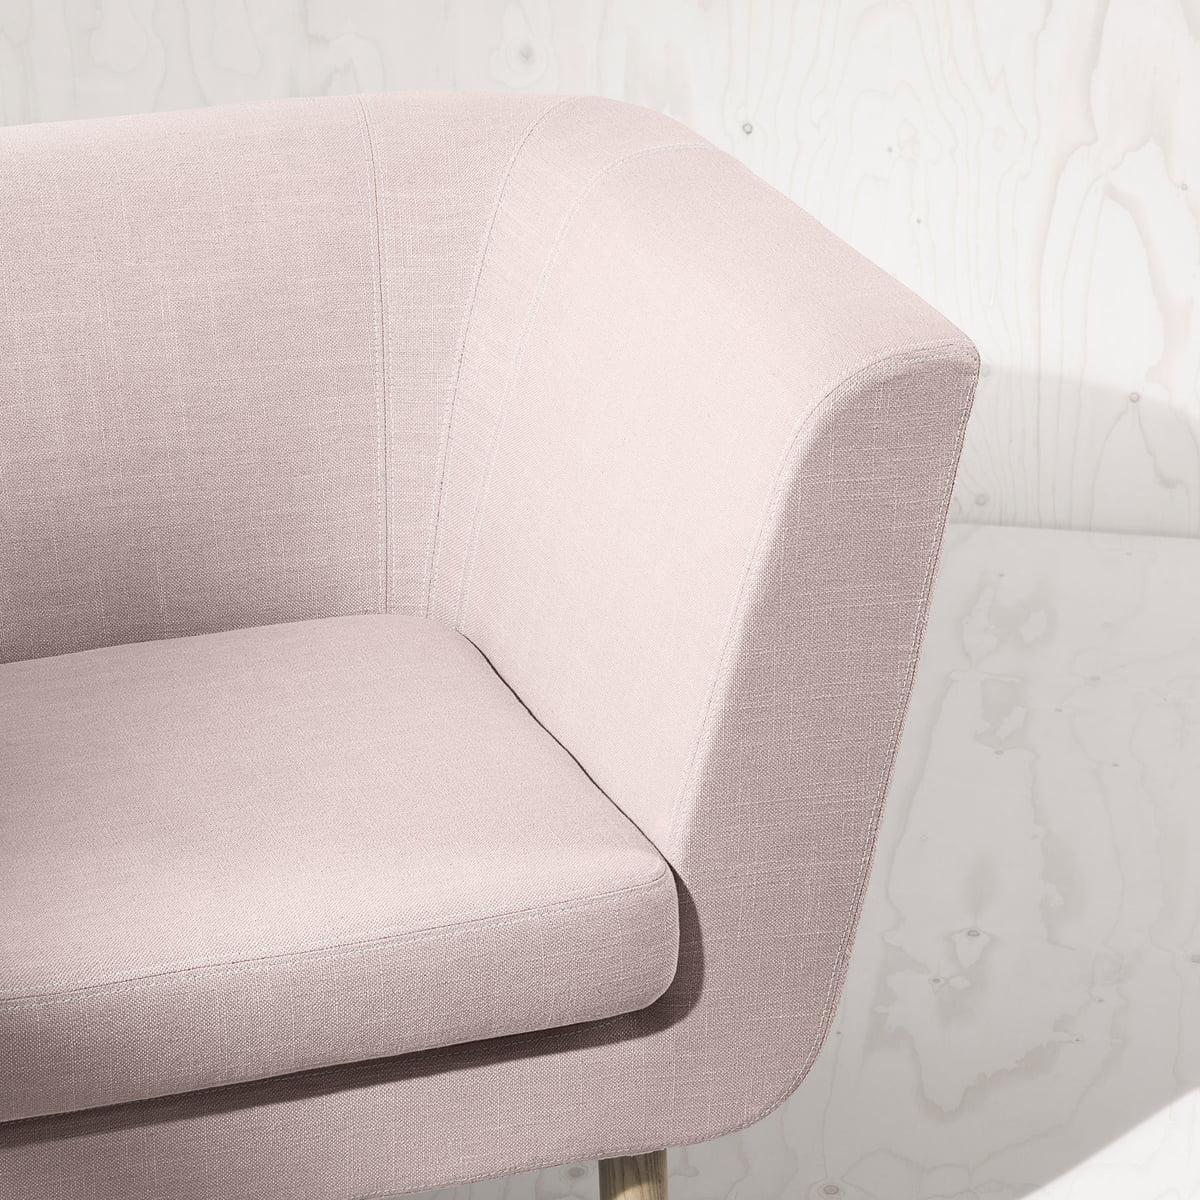 rosa sofa great veja tambm estas dicas para entrar na. Black Bedroom Furniture Sets. Home Design Ideas